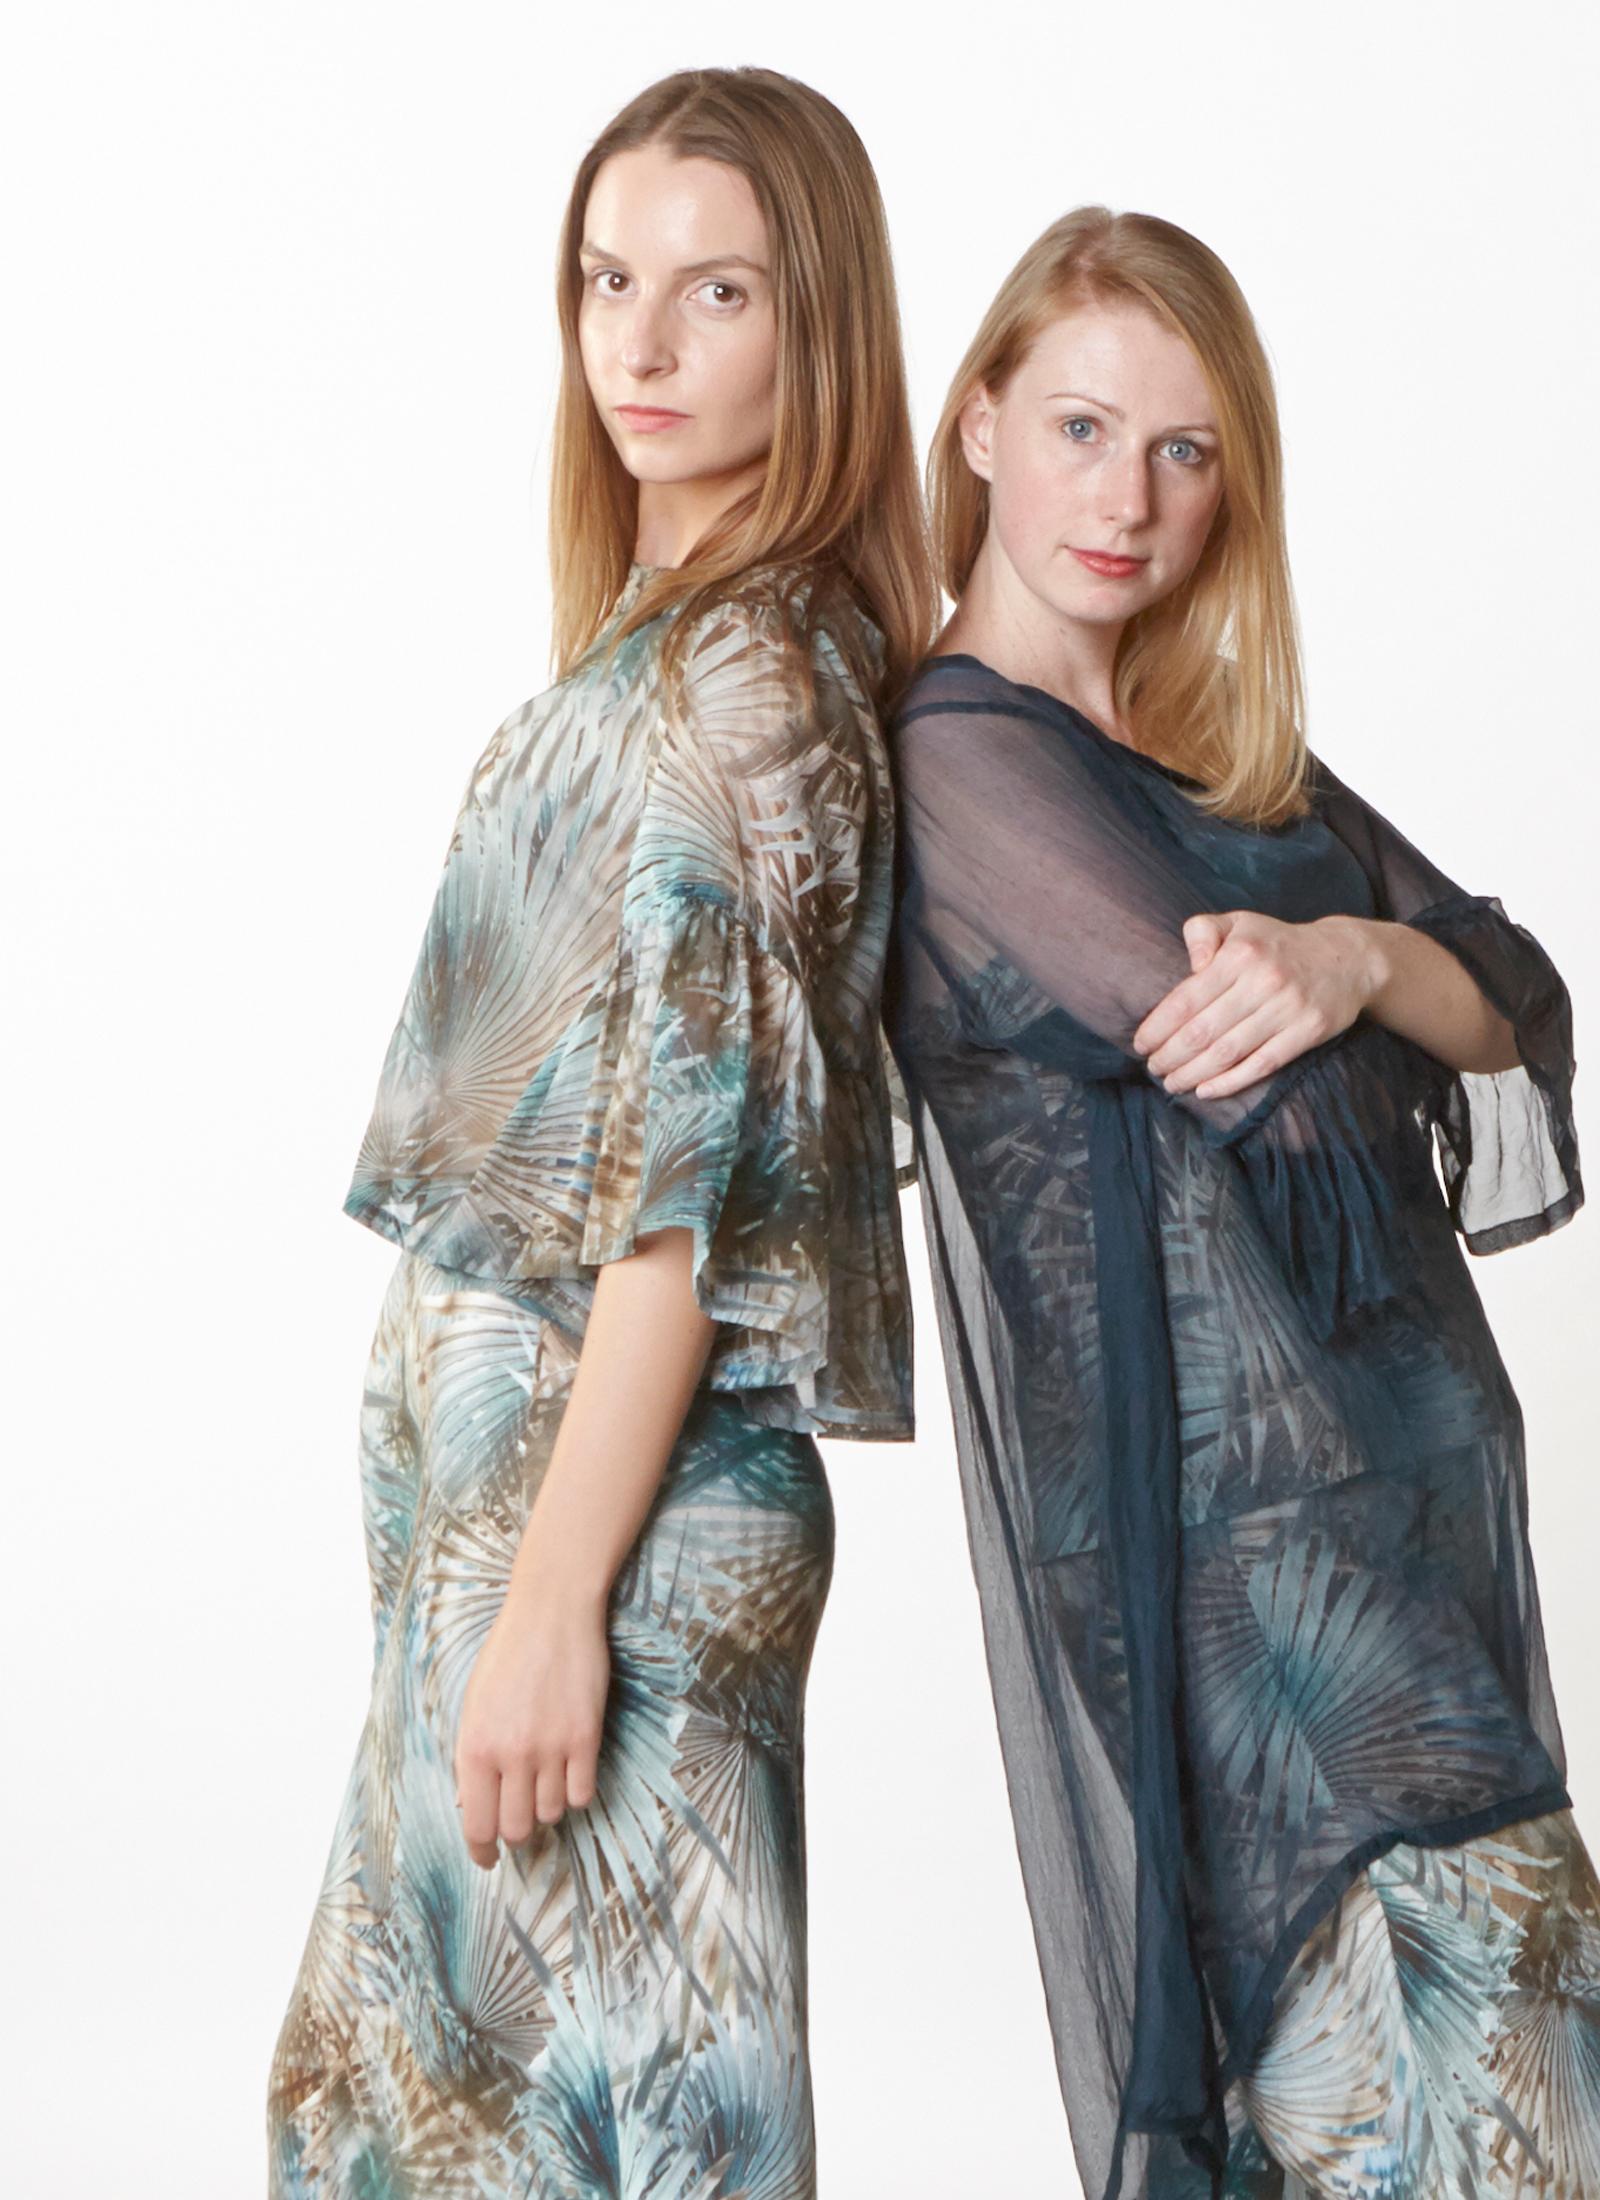 Frida Shirt in Palma Italian Cotton/Silk, Luella Dress, Lucy Tank, Long Bias Skirt in Palma Italian Linen,Phryne Tunic in Teal Italian Sheer Tie Dye Silk